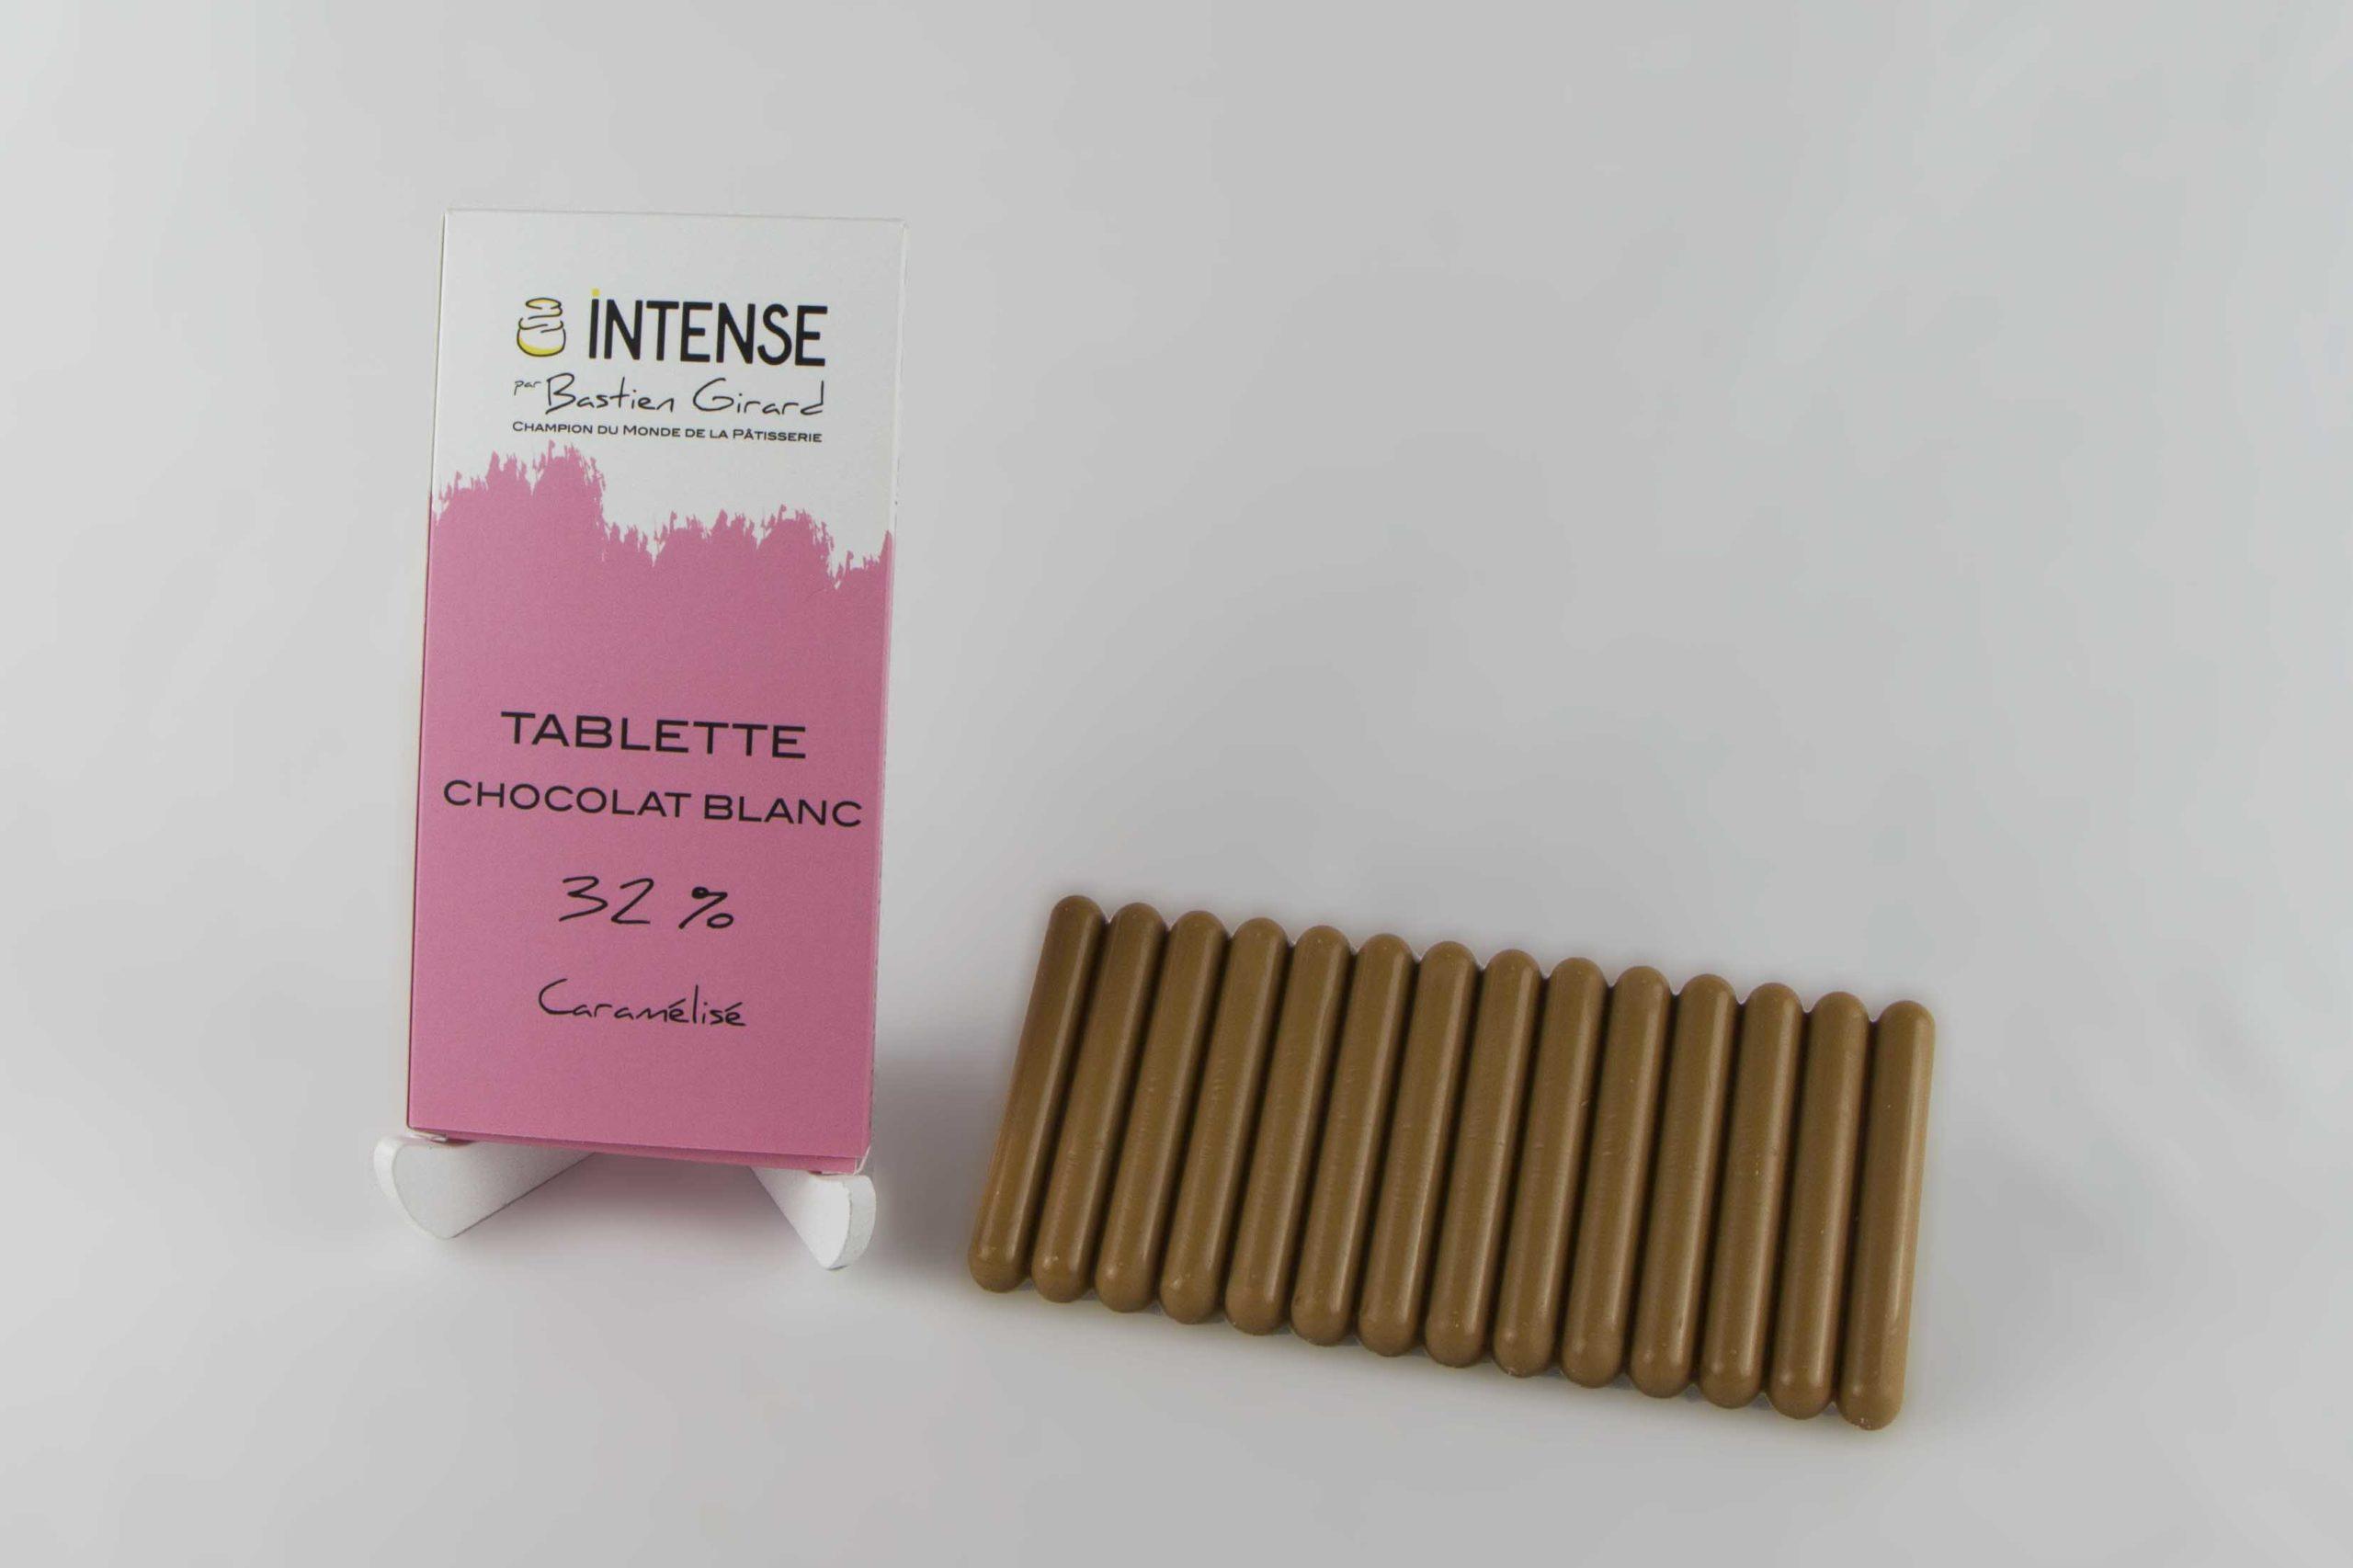 tablette chocolat blanc caramelise